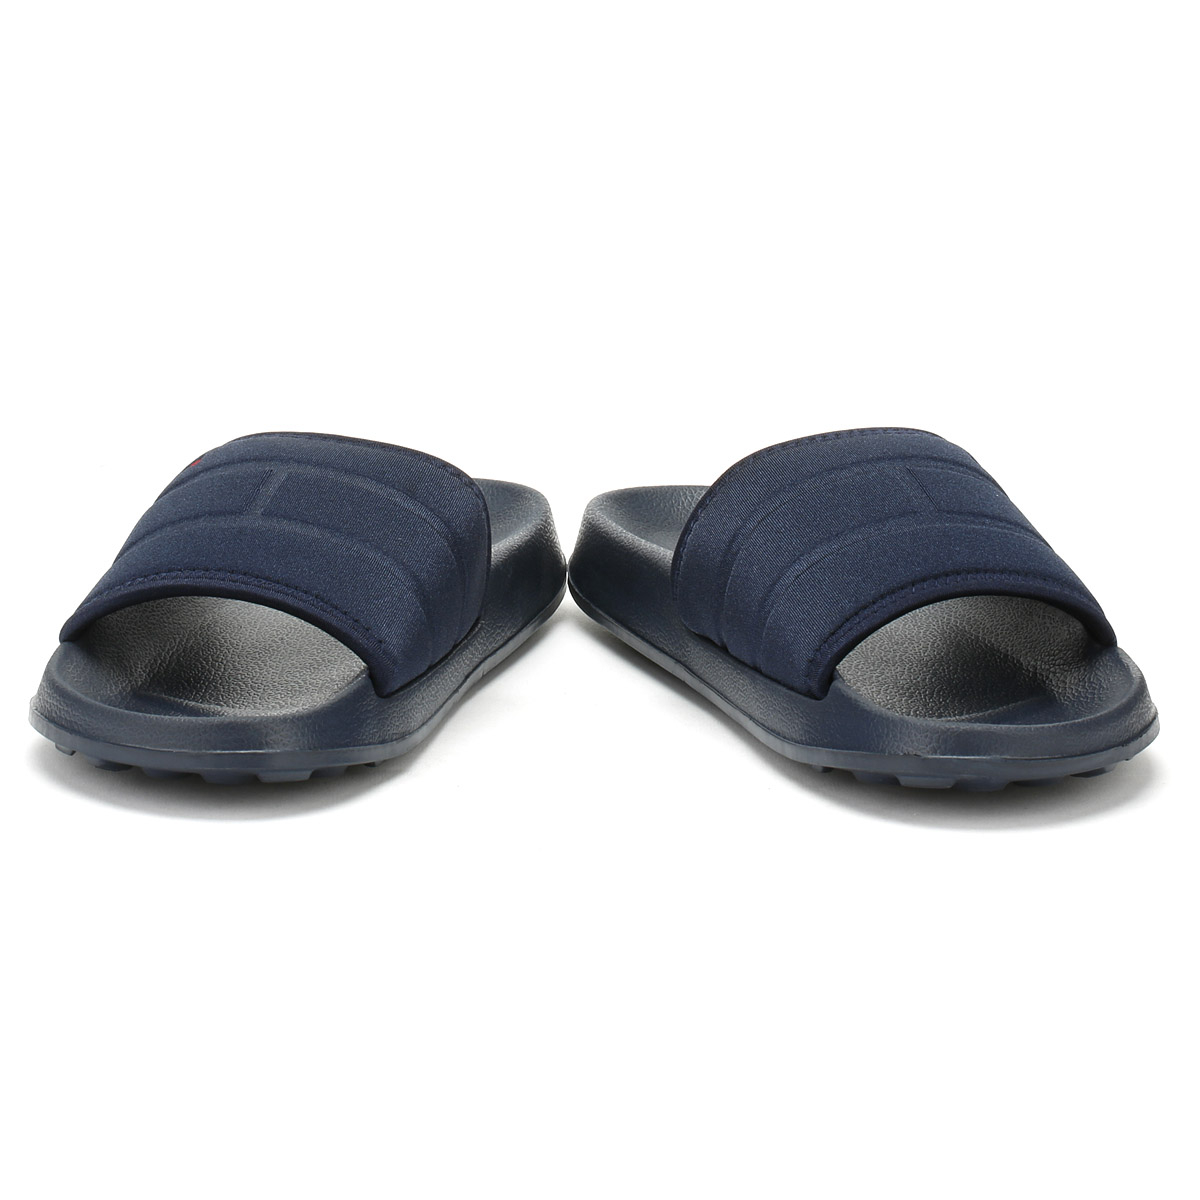 99661694e Tommy Hilfiger Mens Slides Midnight Navy Flag Pool Sandals Summer Beach  Shoes